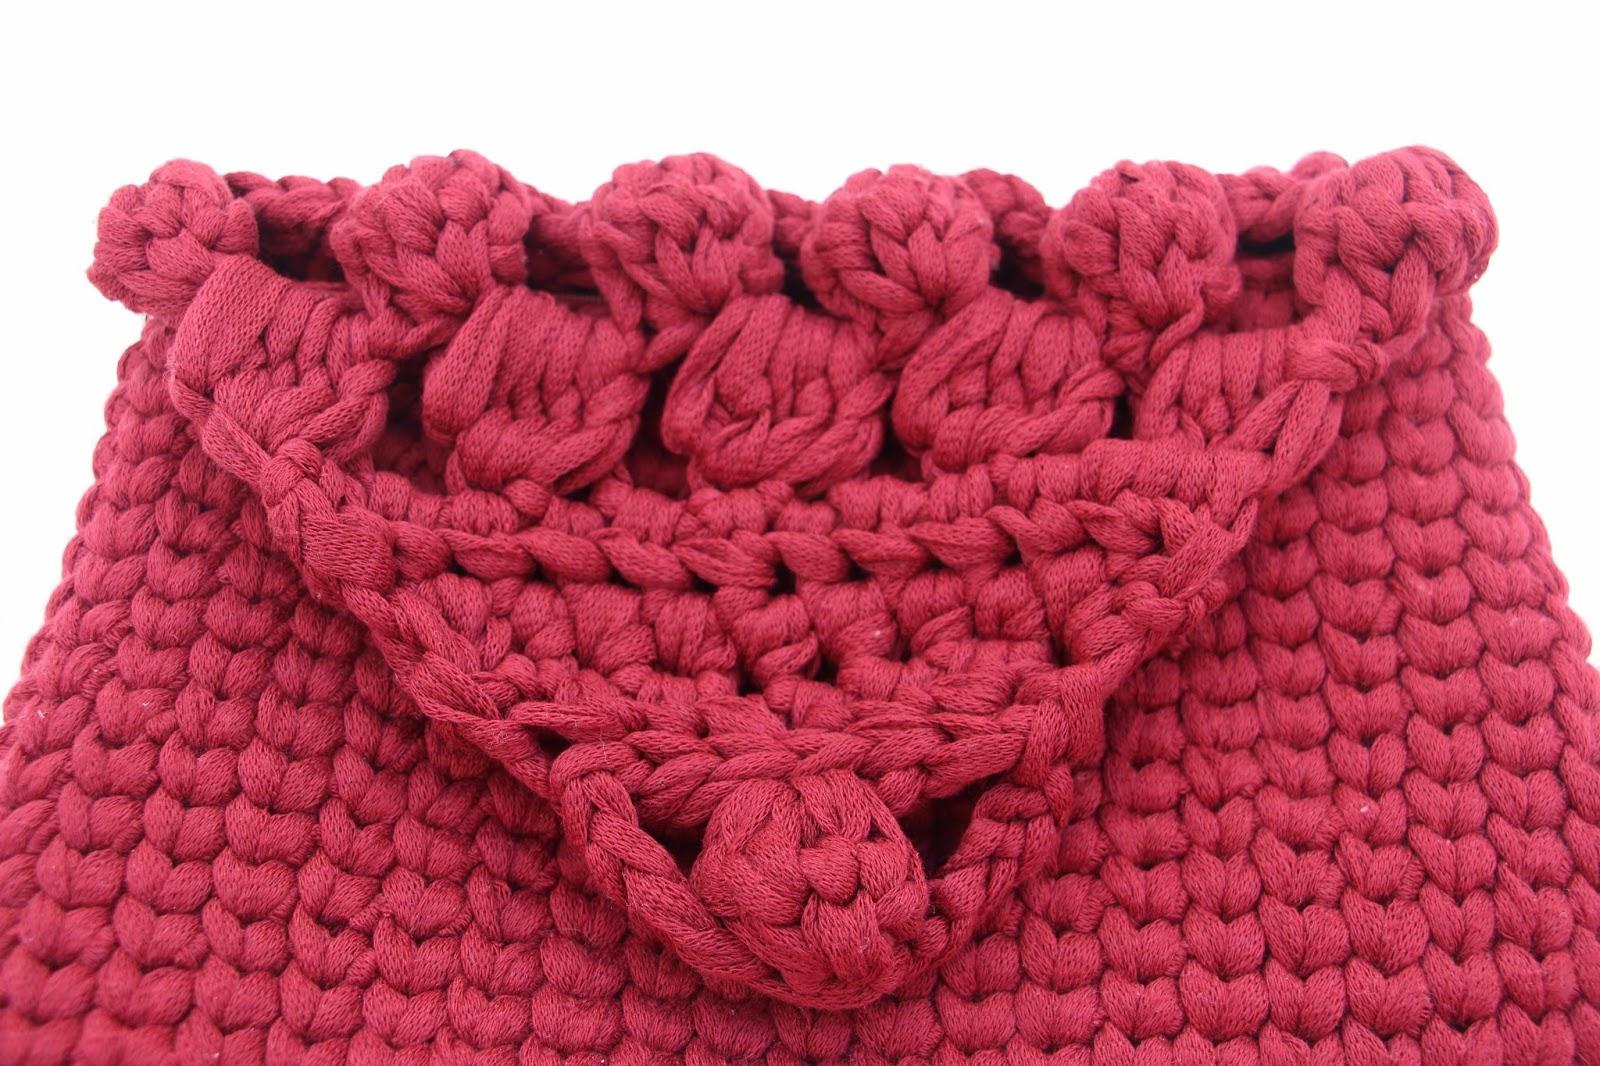 patron bolso crochet